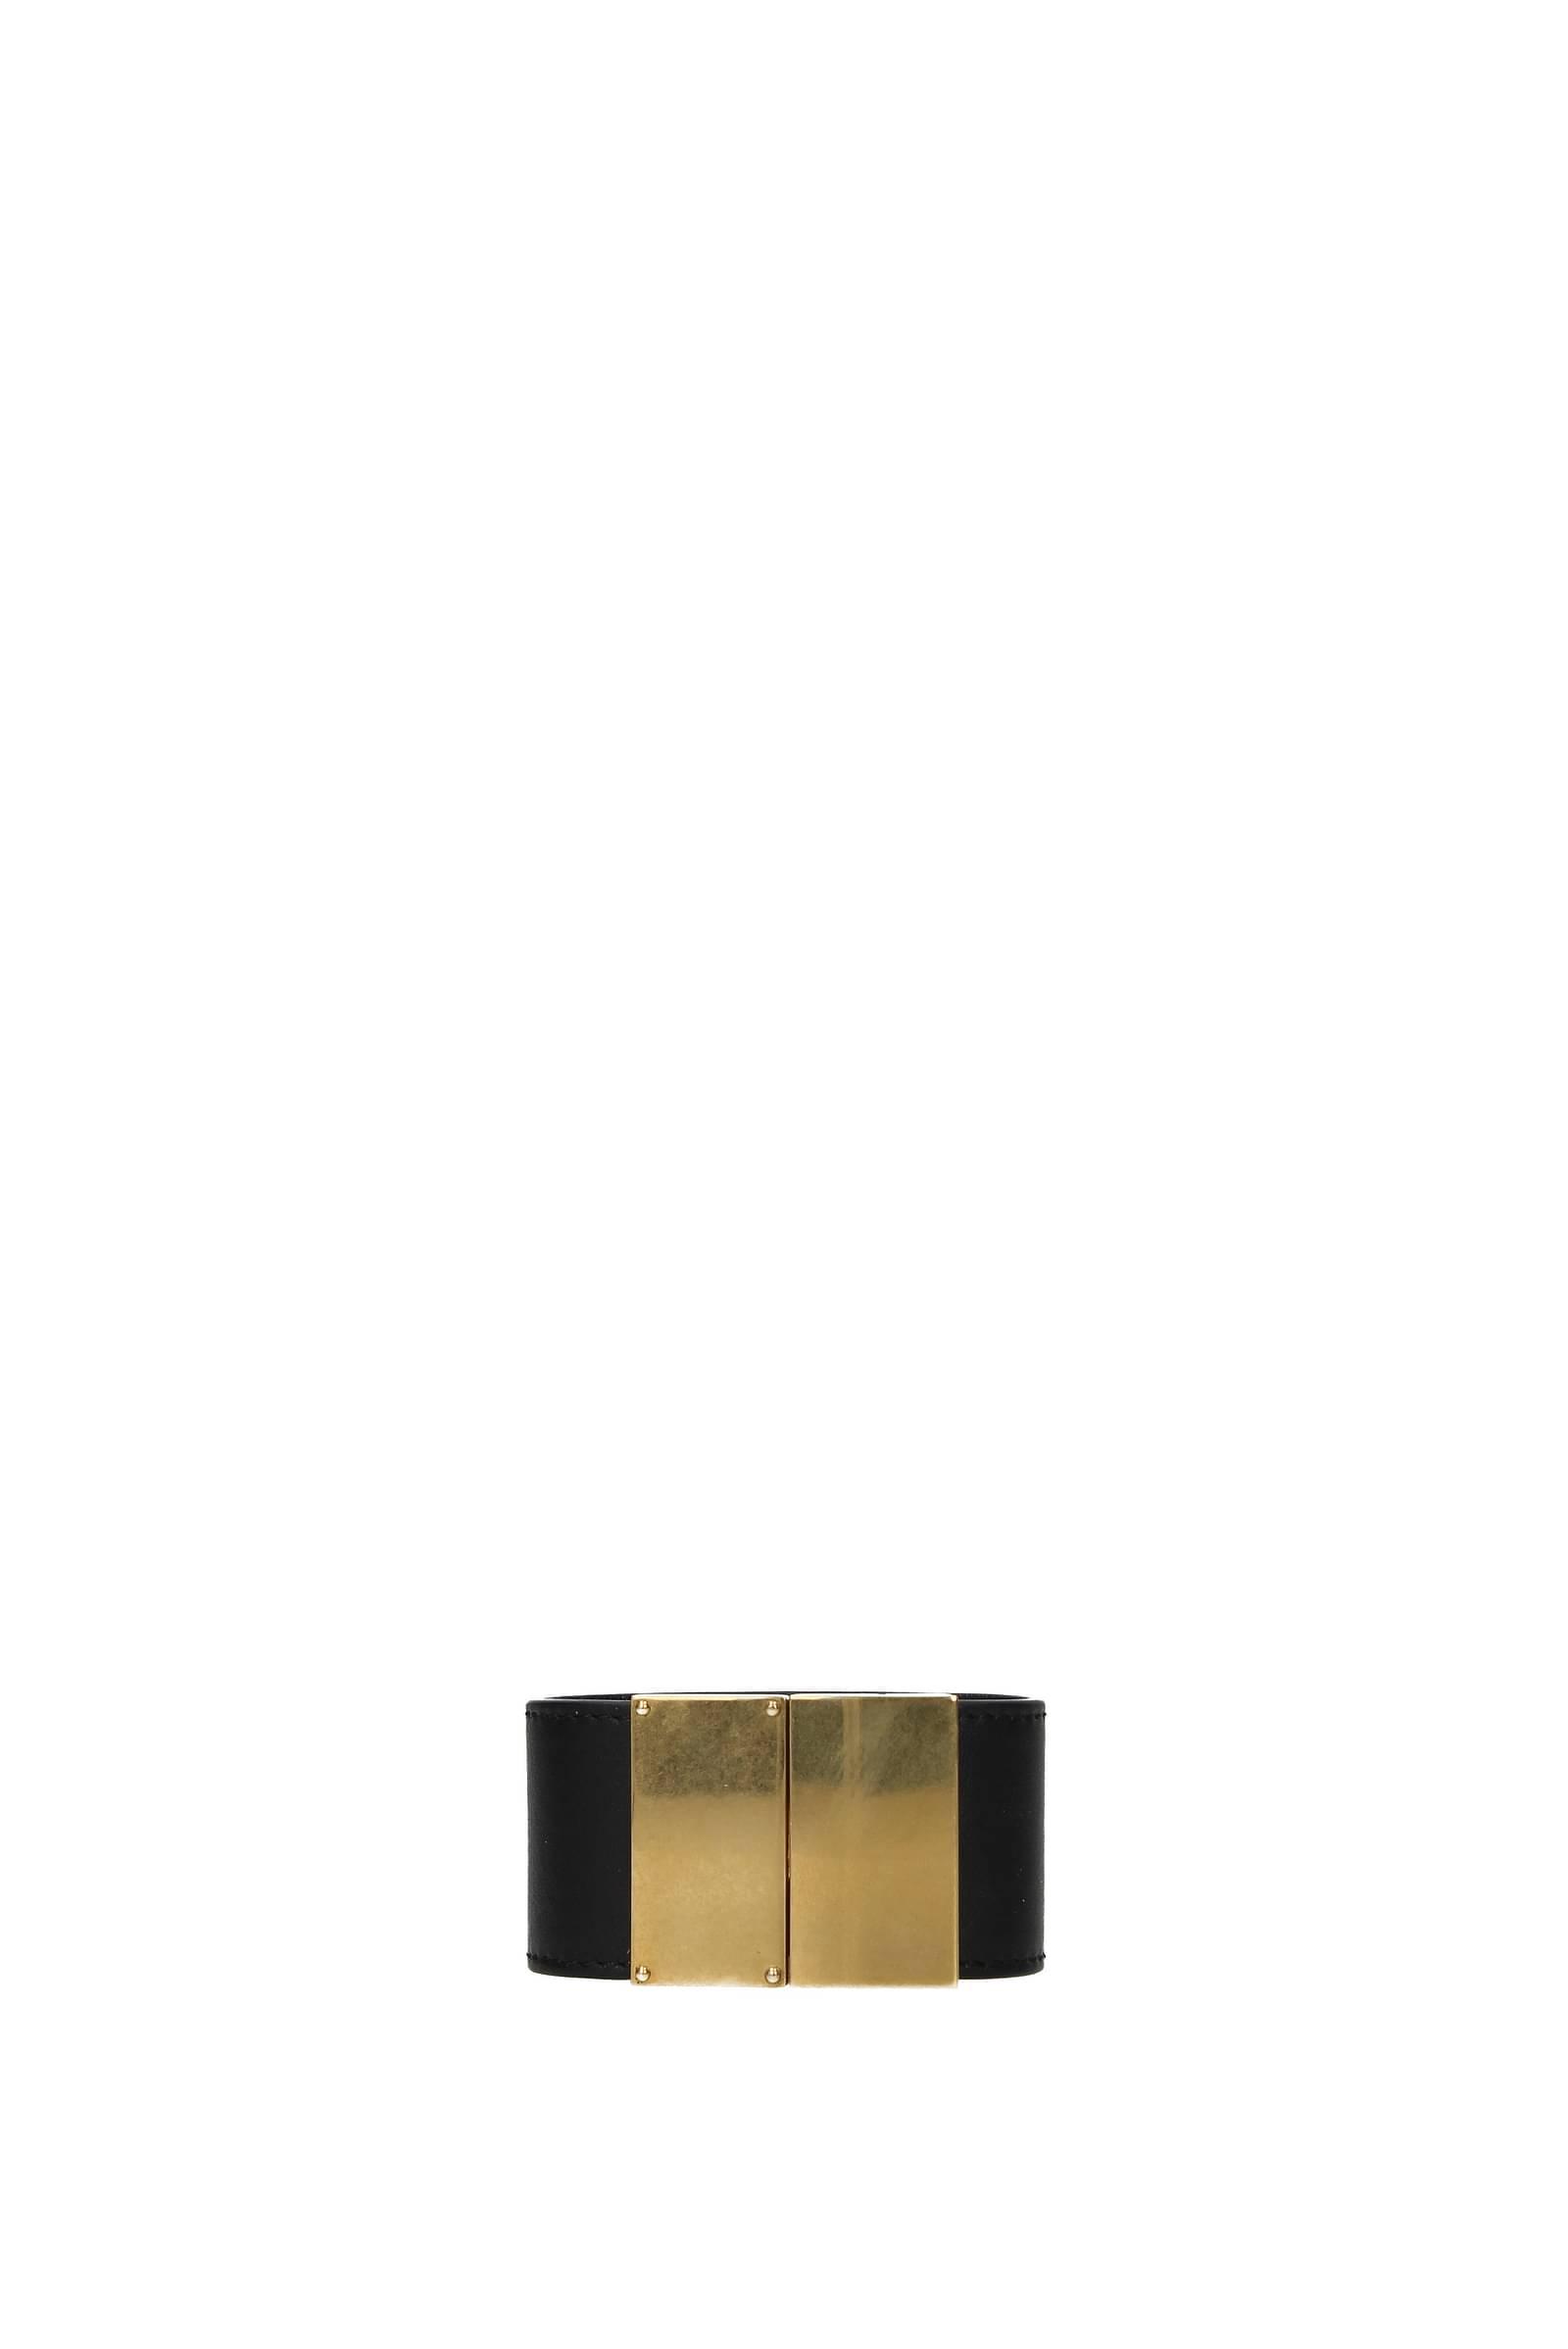 Bracciali-Celine-Donna-Pelle-46I143SN miniatura 4